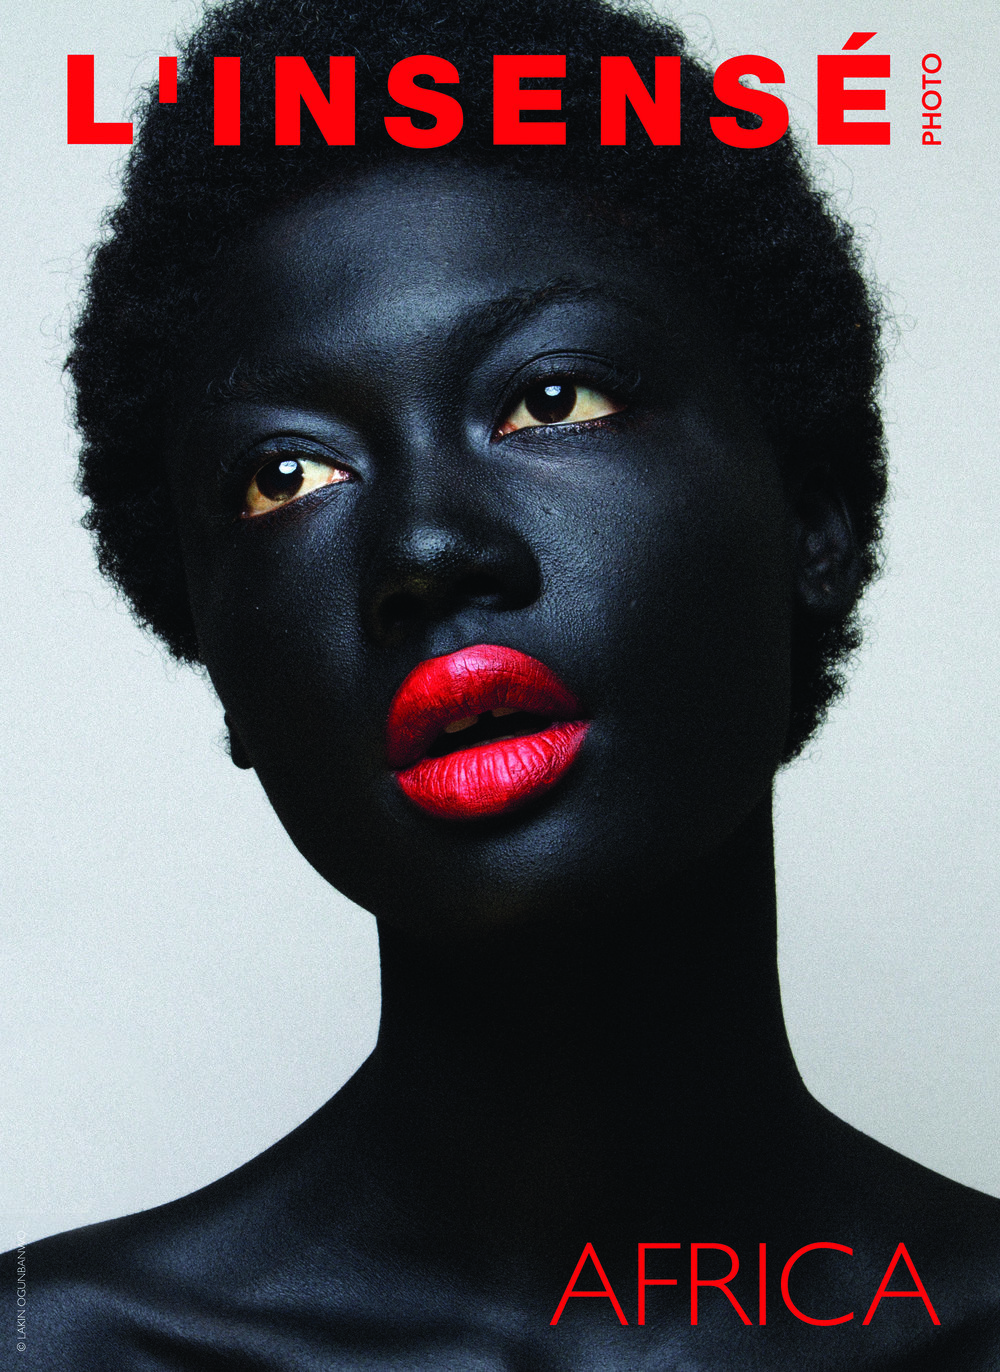 COVER-AFRICA-INSENSE-CB.jpg